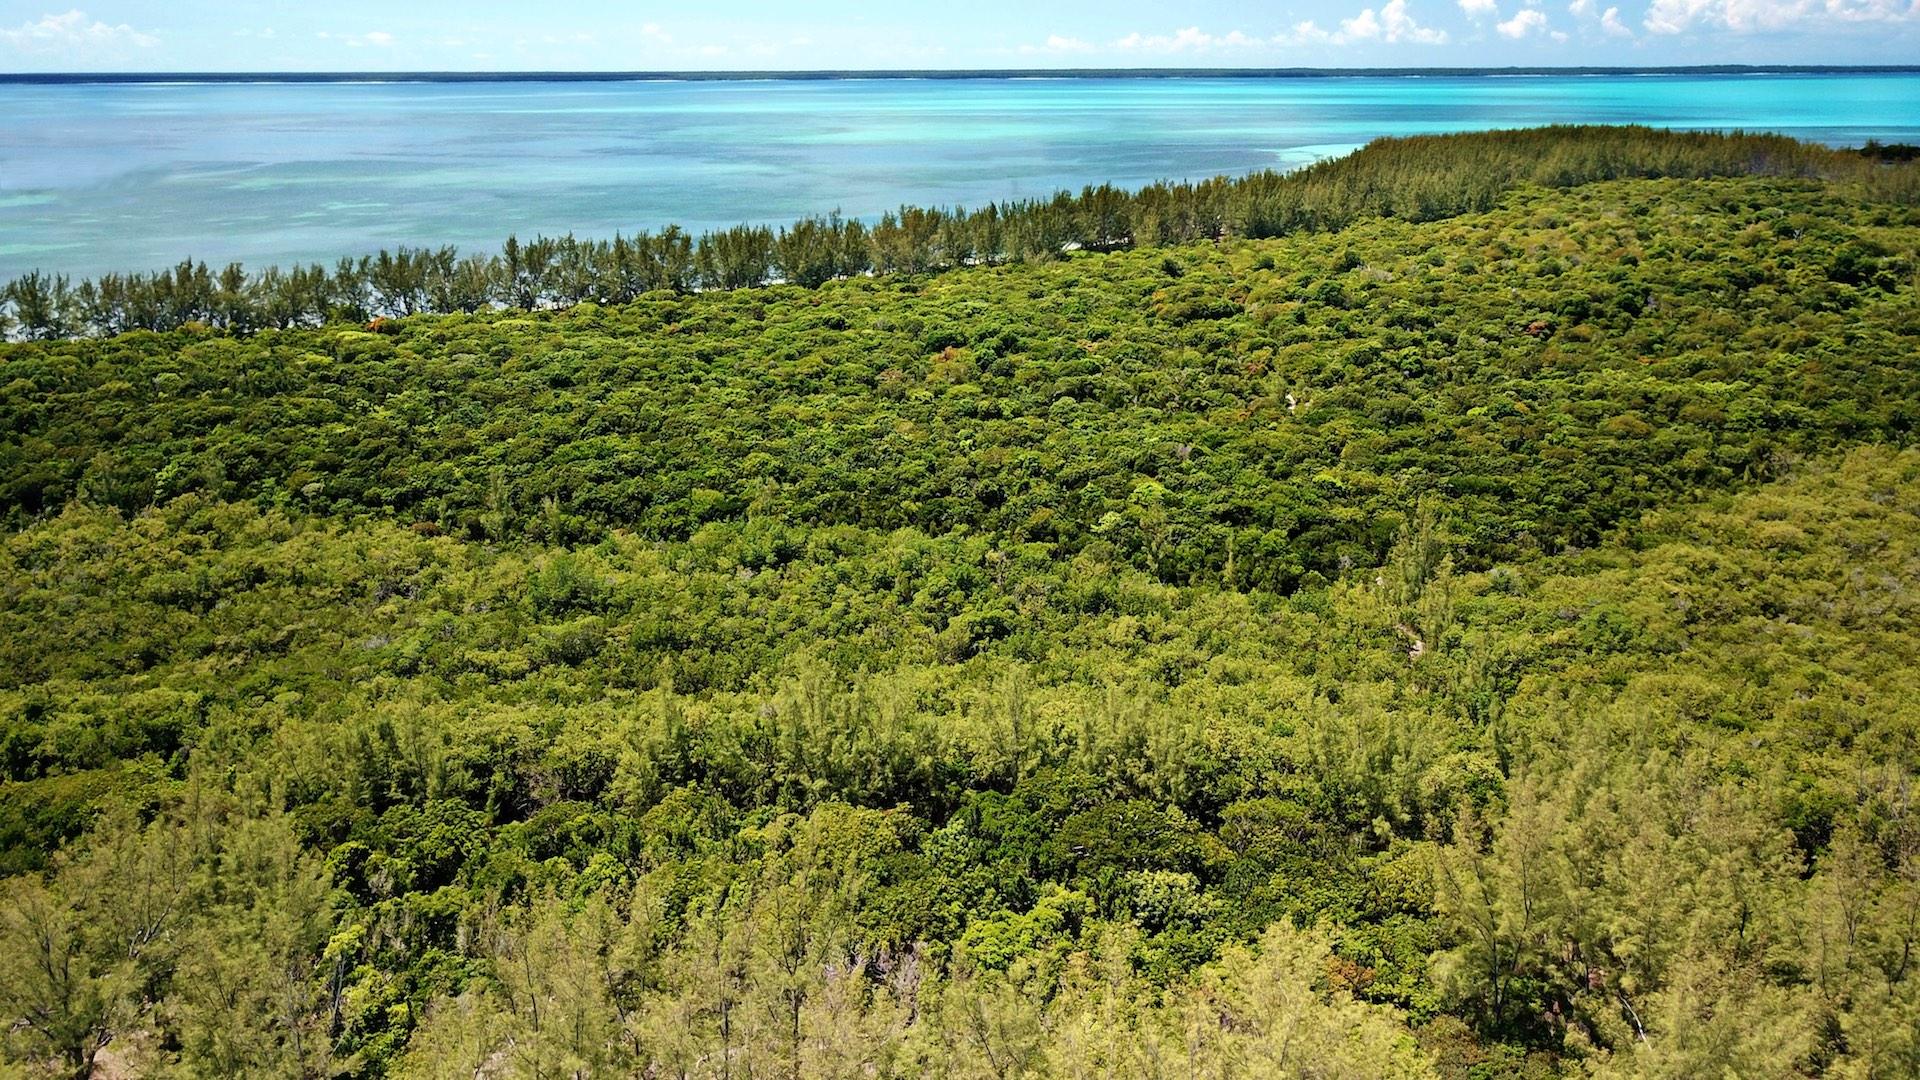 Sea to sea beachfront acreage on Munjack Cay for sale